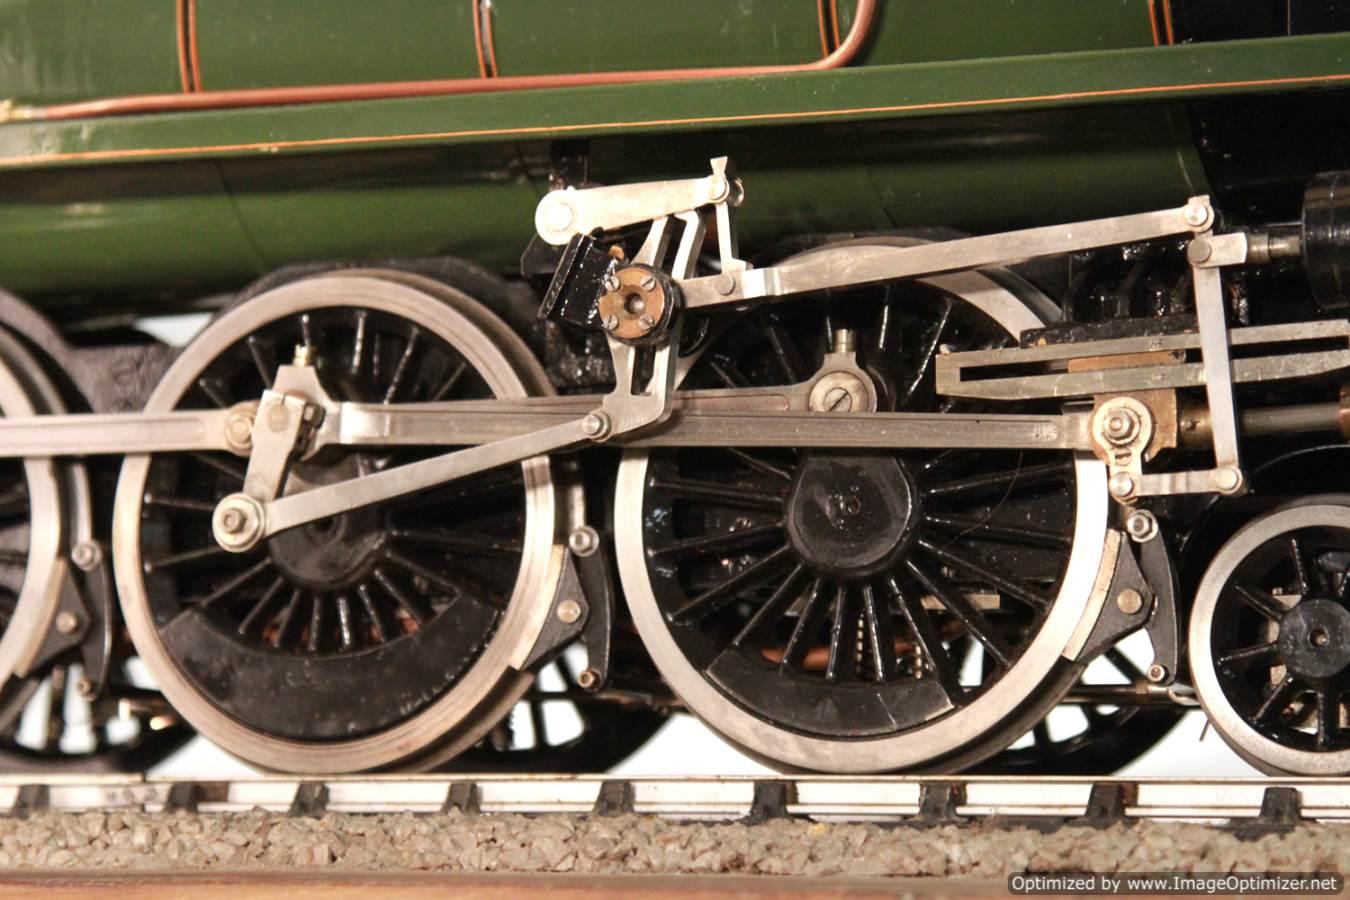 test BR Britannia live steam locomotive for sale 06 Optimized